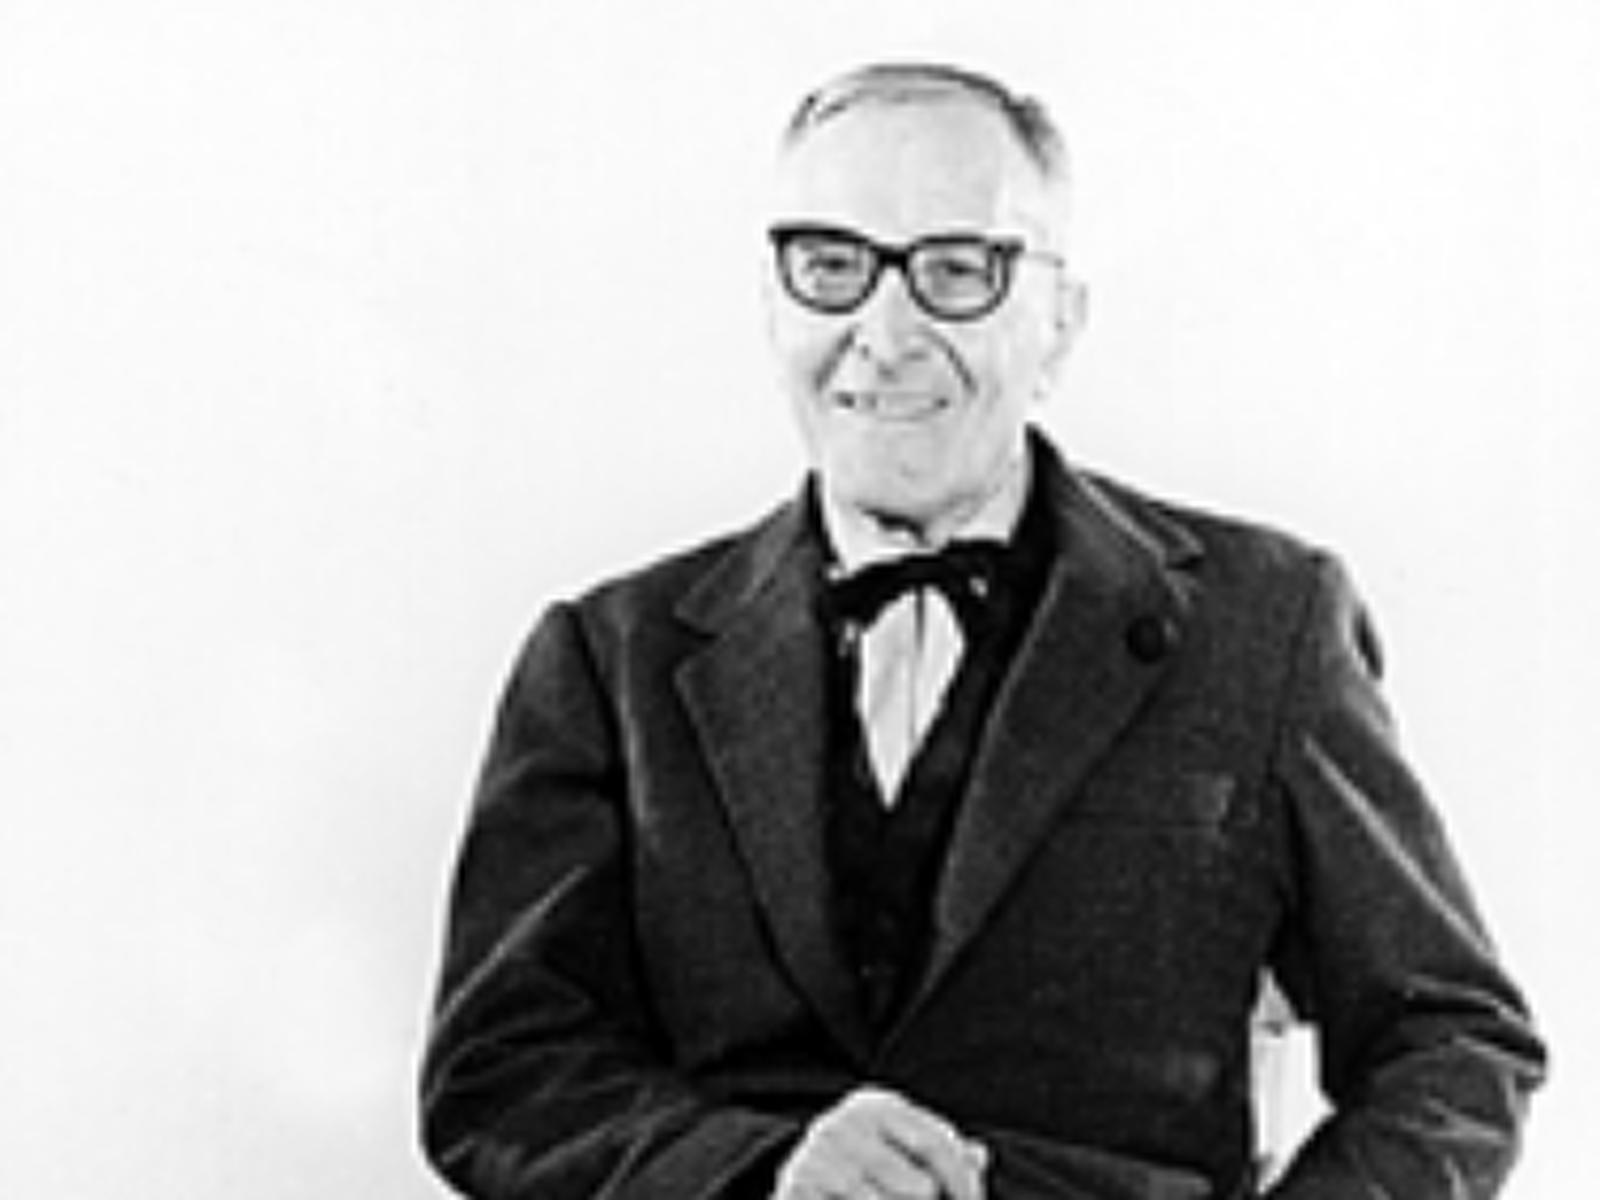 Alexandre Galí